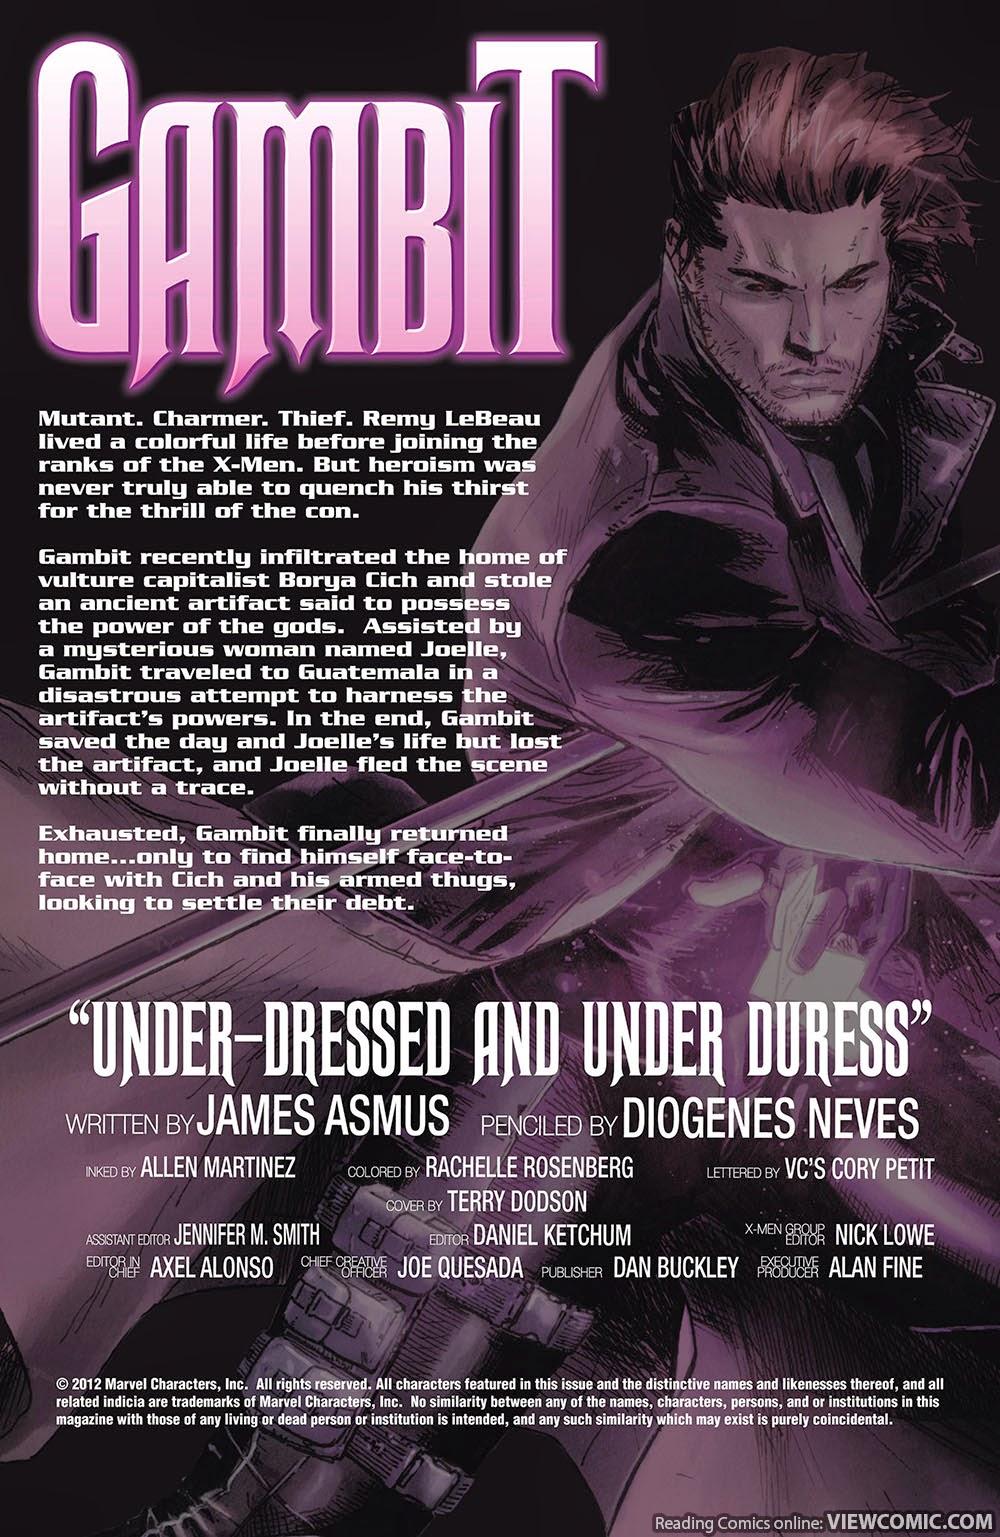 Gambit v5 005 (2013) ………………………………… | Viewcomic reading